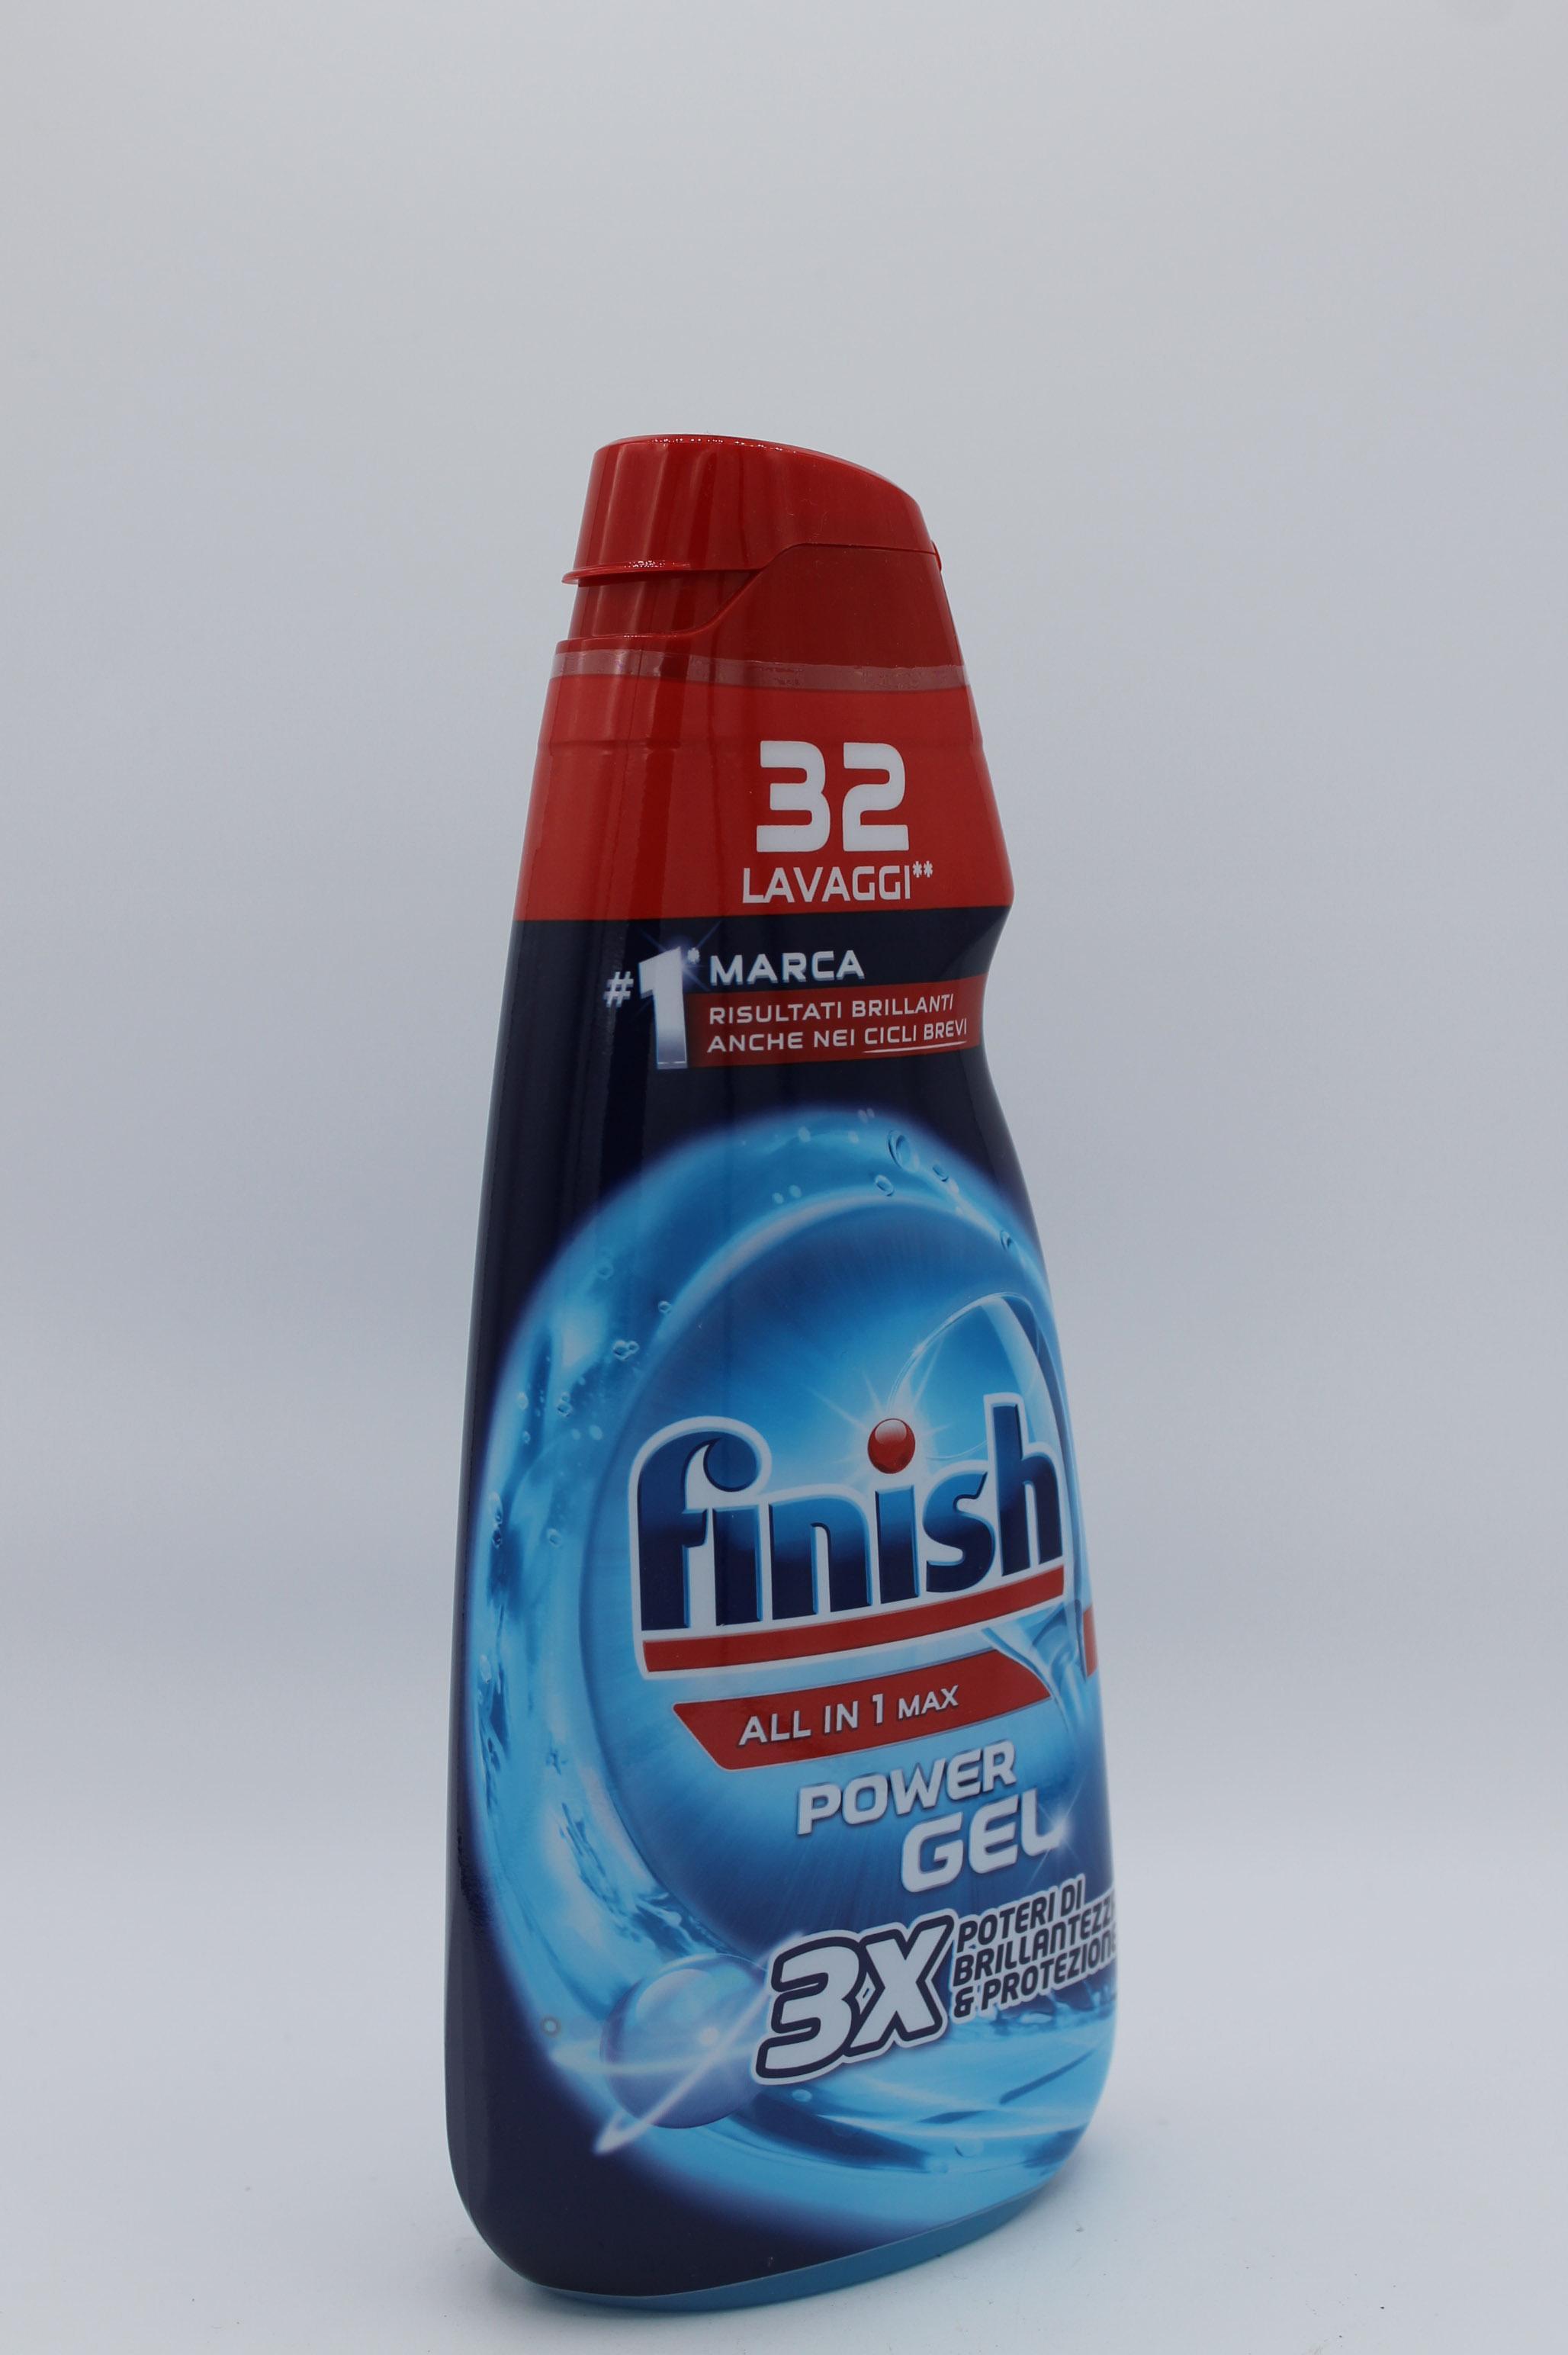 Finish detersivo lavastoviglie power gel 650ml.